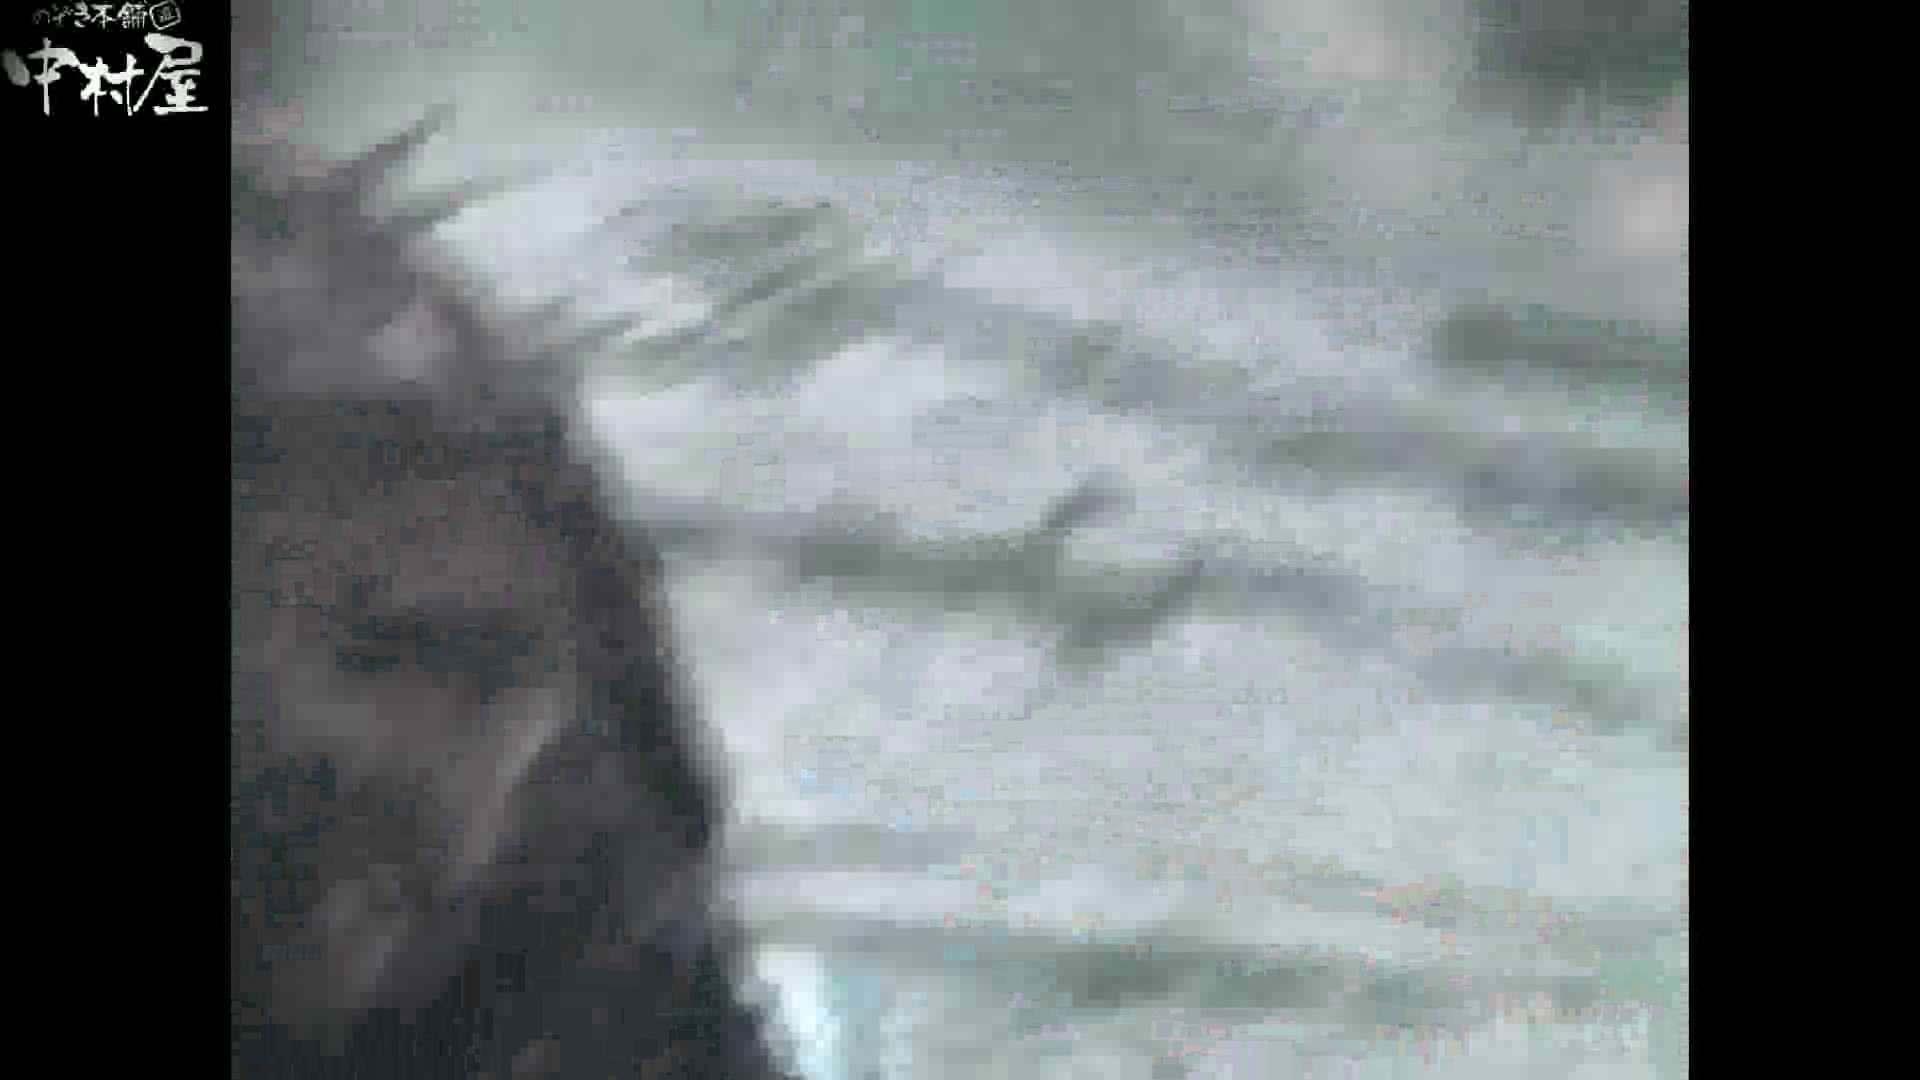 Aquaな露天風呂Vol.867潜入盗撮露天風呂参判湯 其の八 OLのエロ生活 性交動画流出 103連発 2